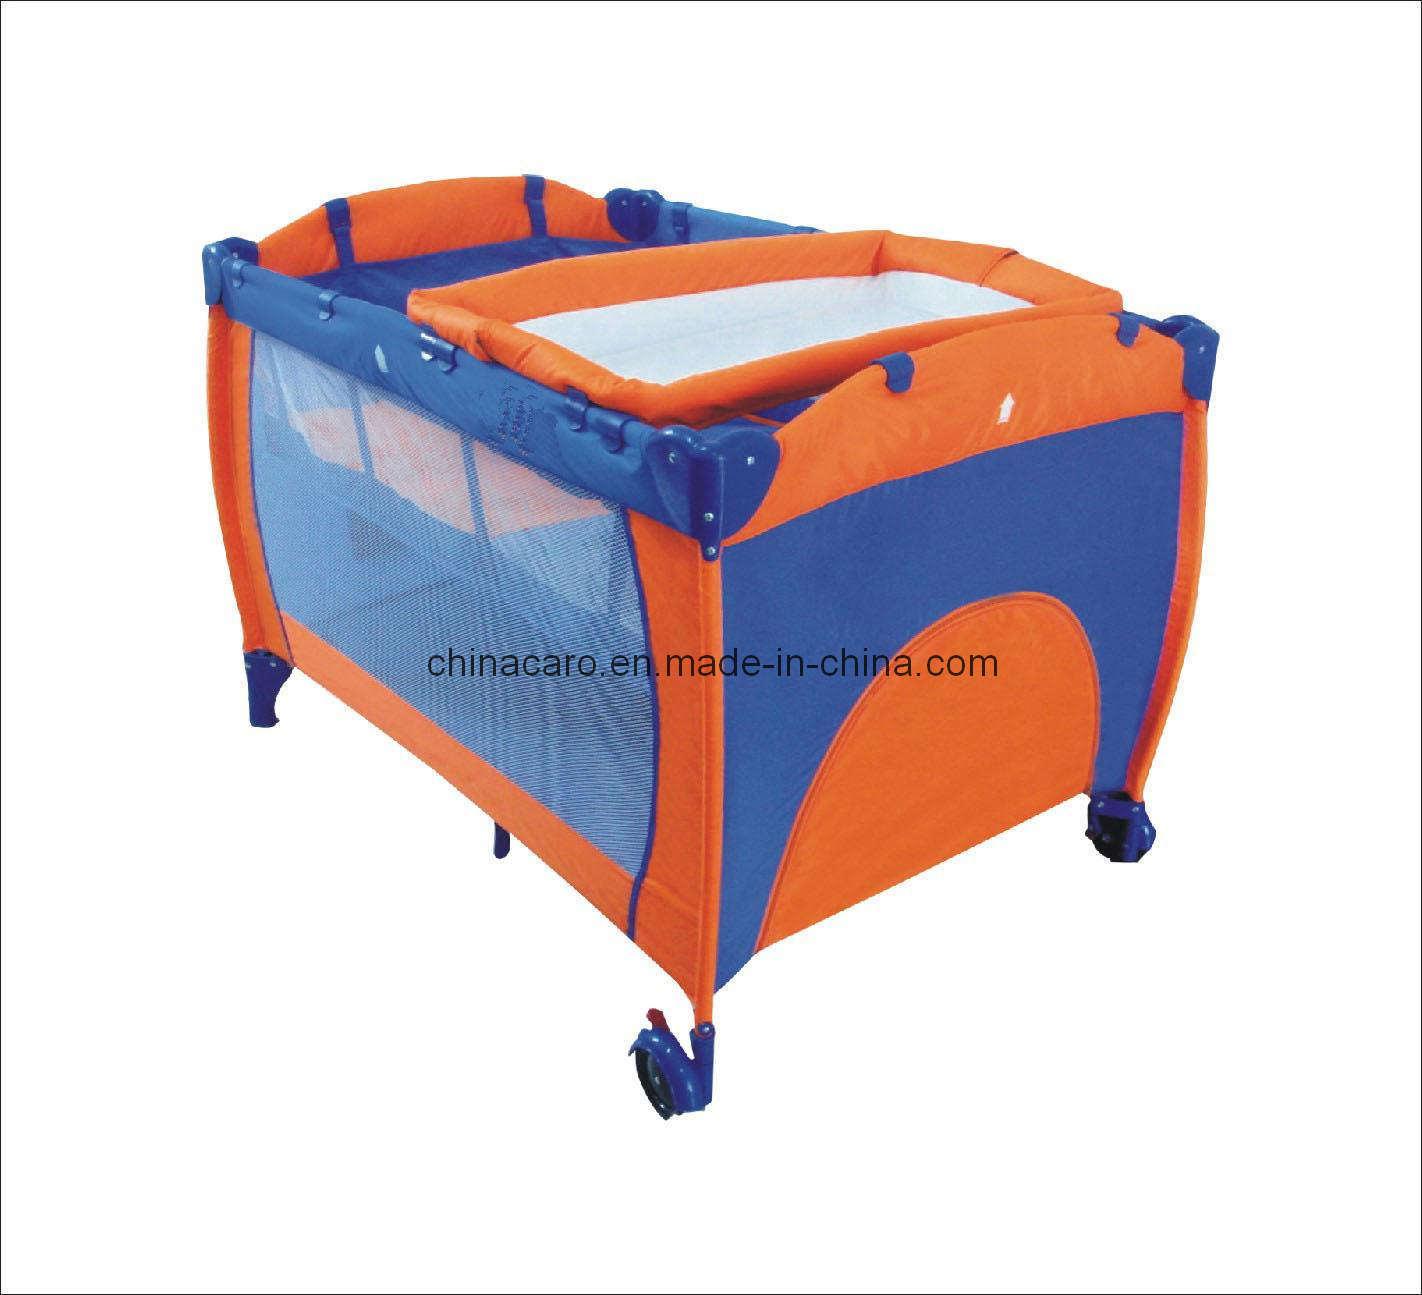 China Baby Cot Bed Ca Pp67 China Baby Cot Bed Crib